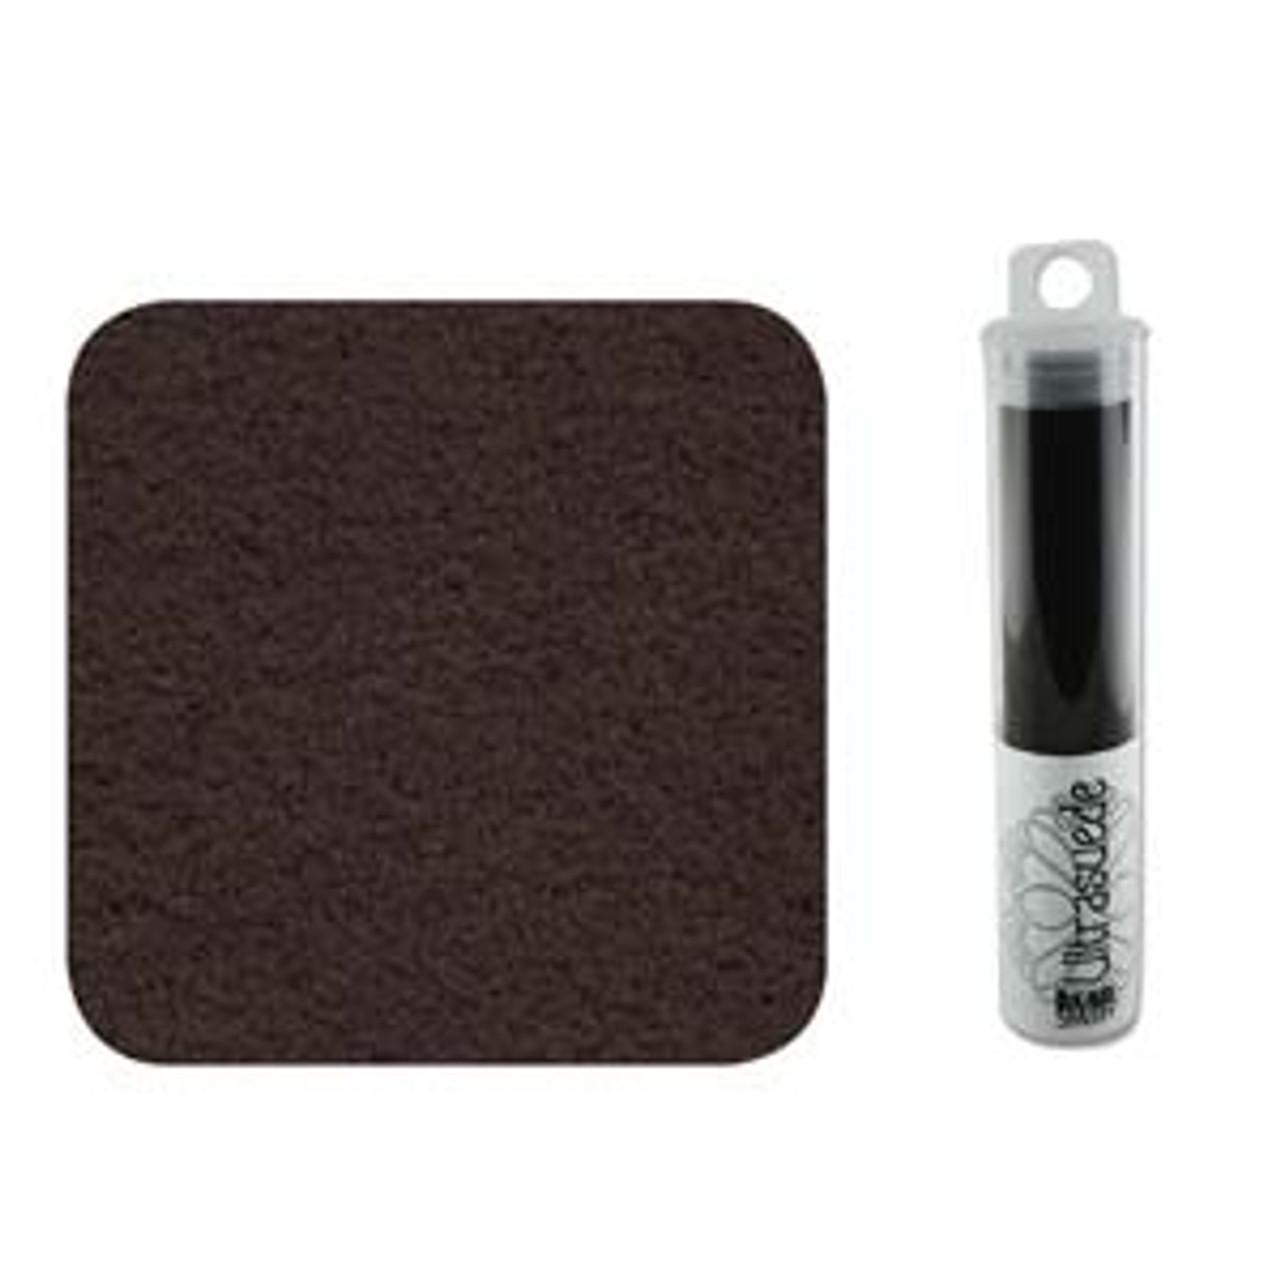 Coffee Bean Ultra Suede 8.5x4.25